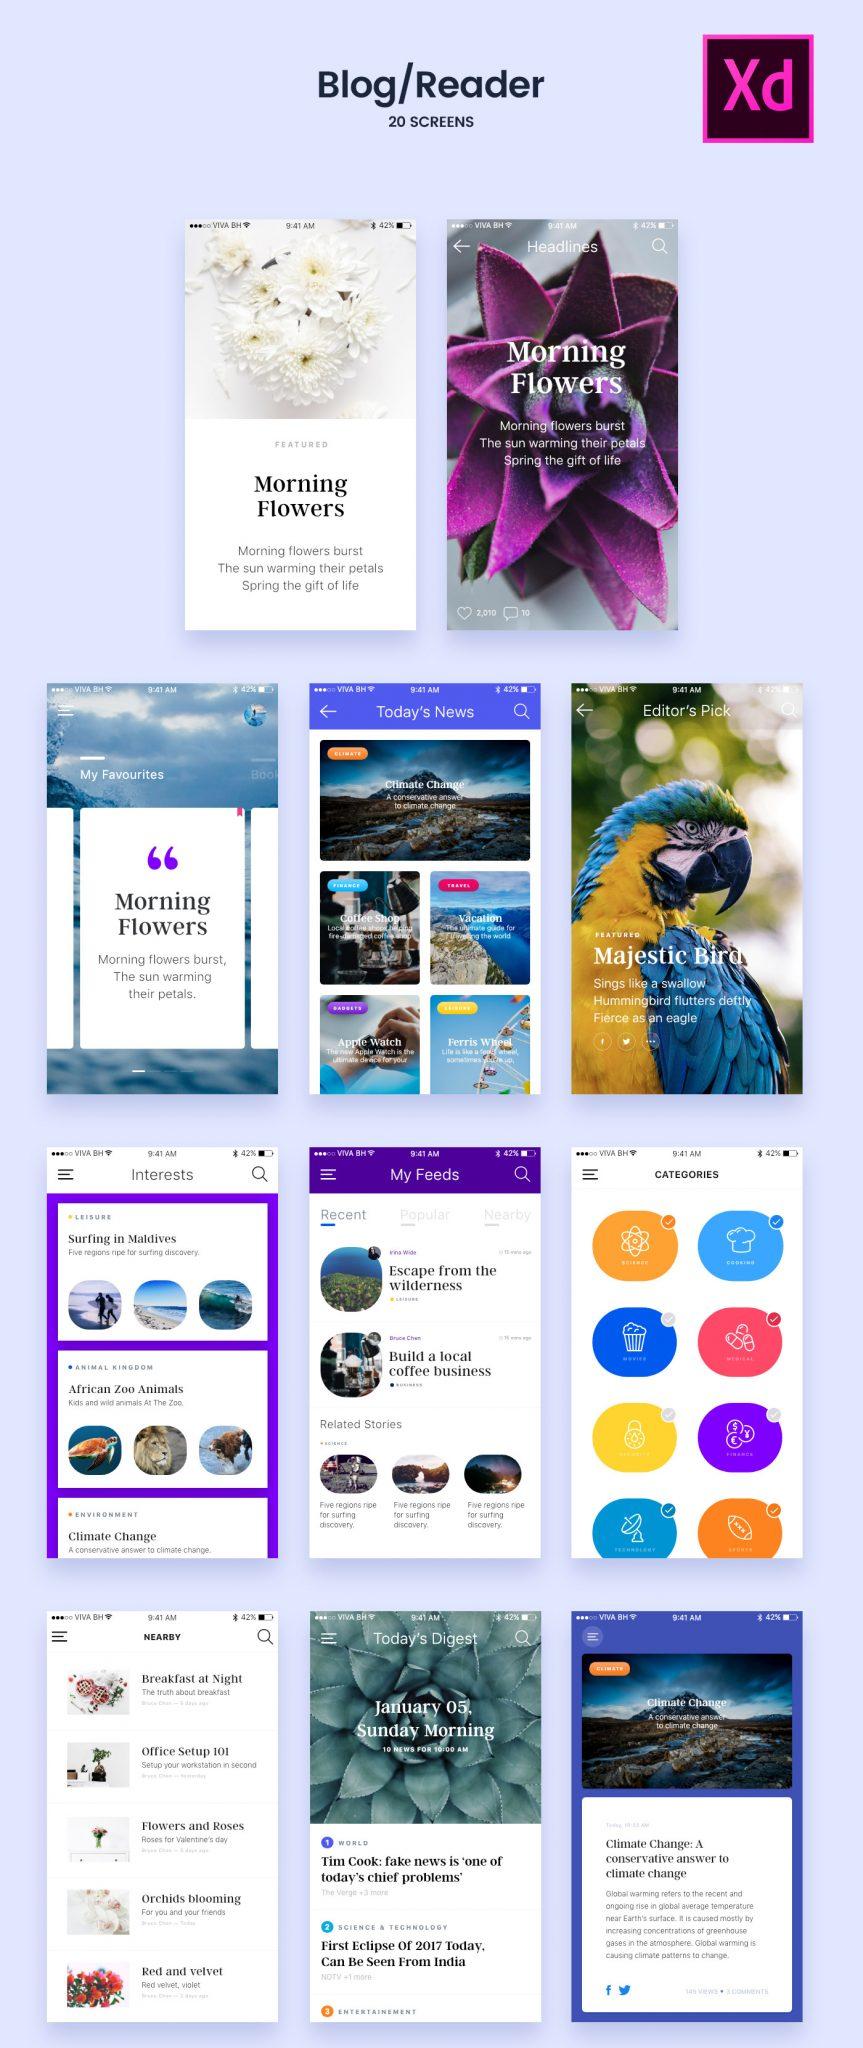 Freebie XD - Blog/Reader UI Screens Free Kit Screens